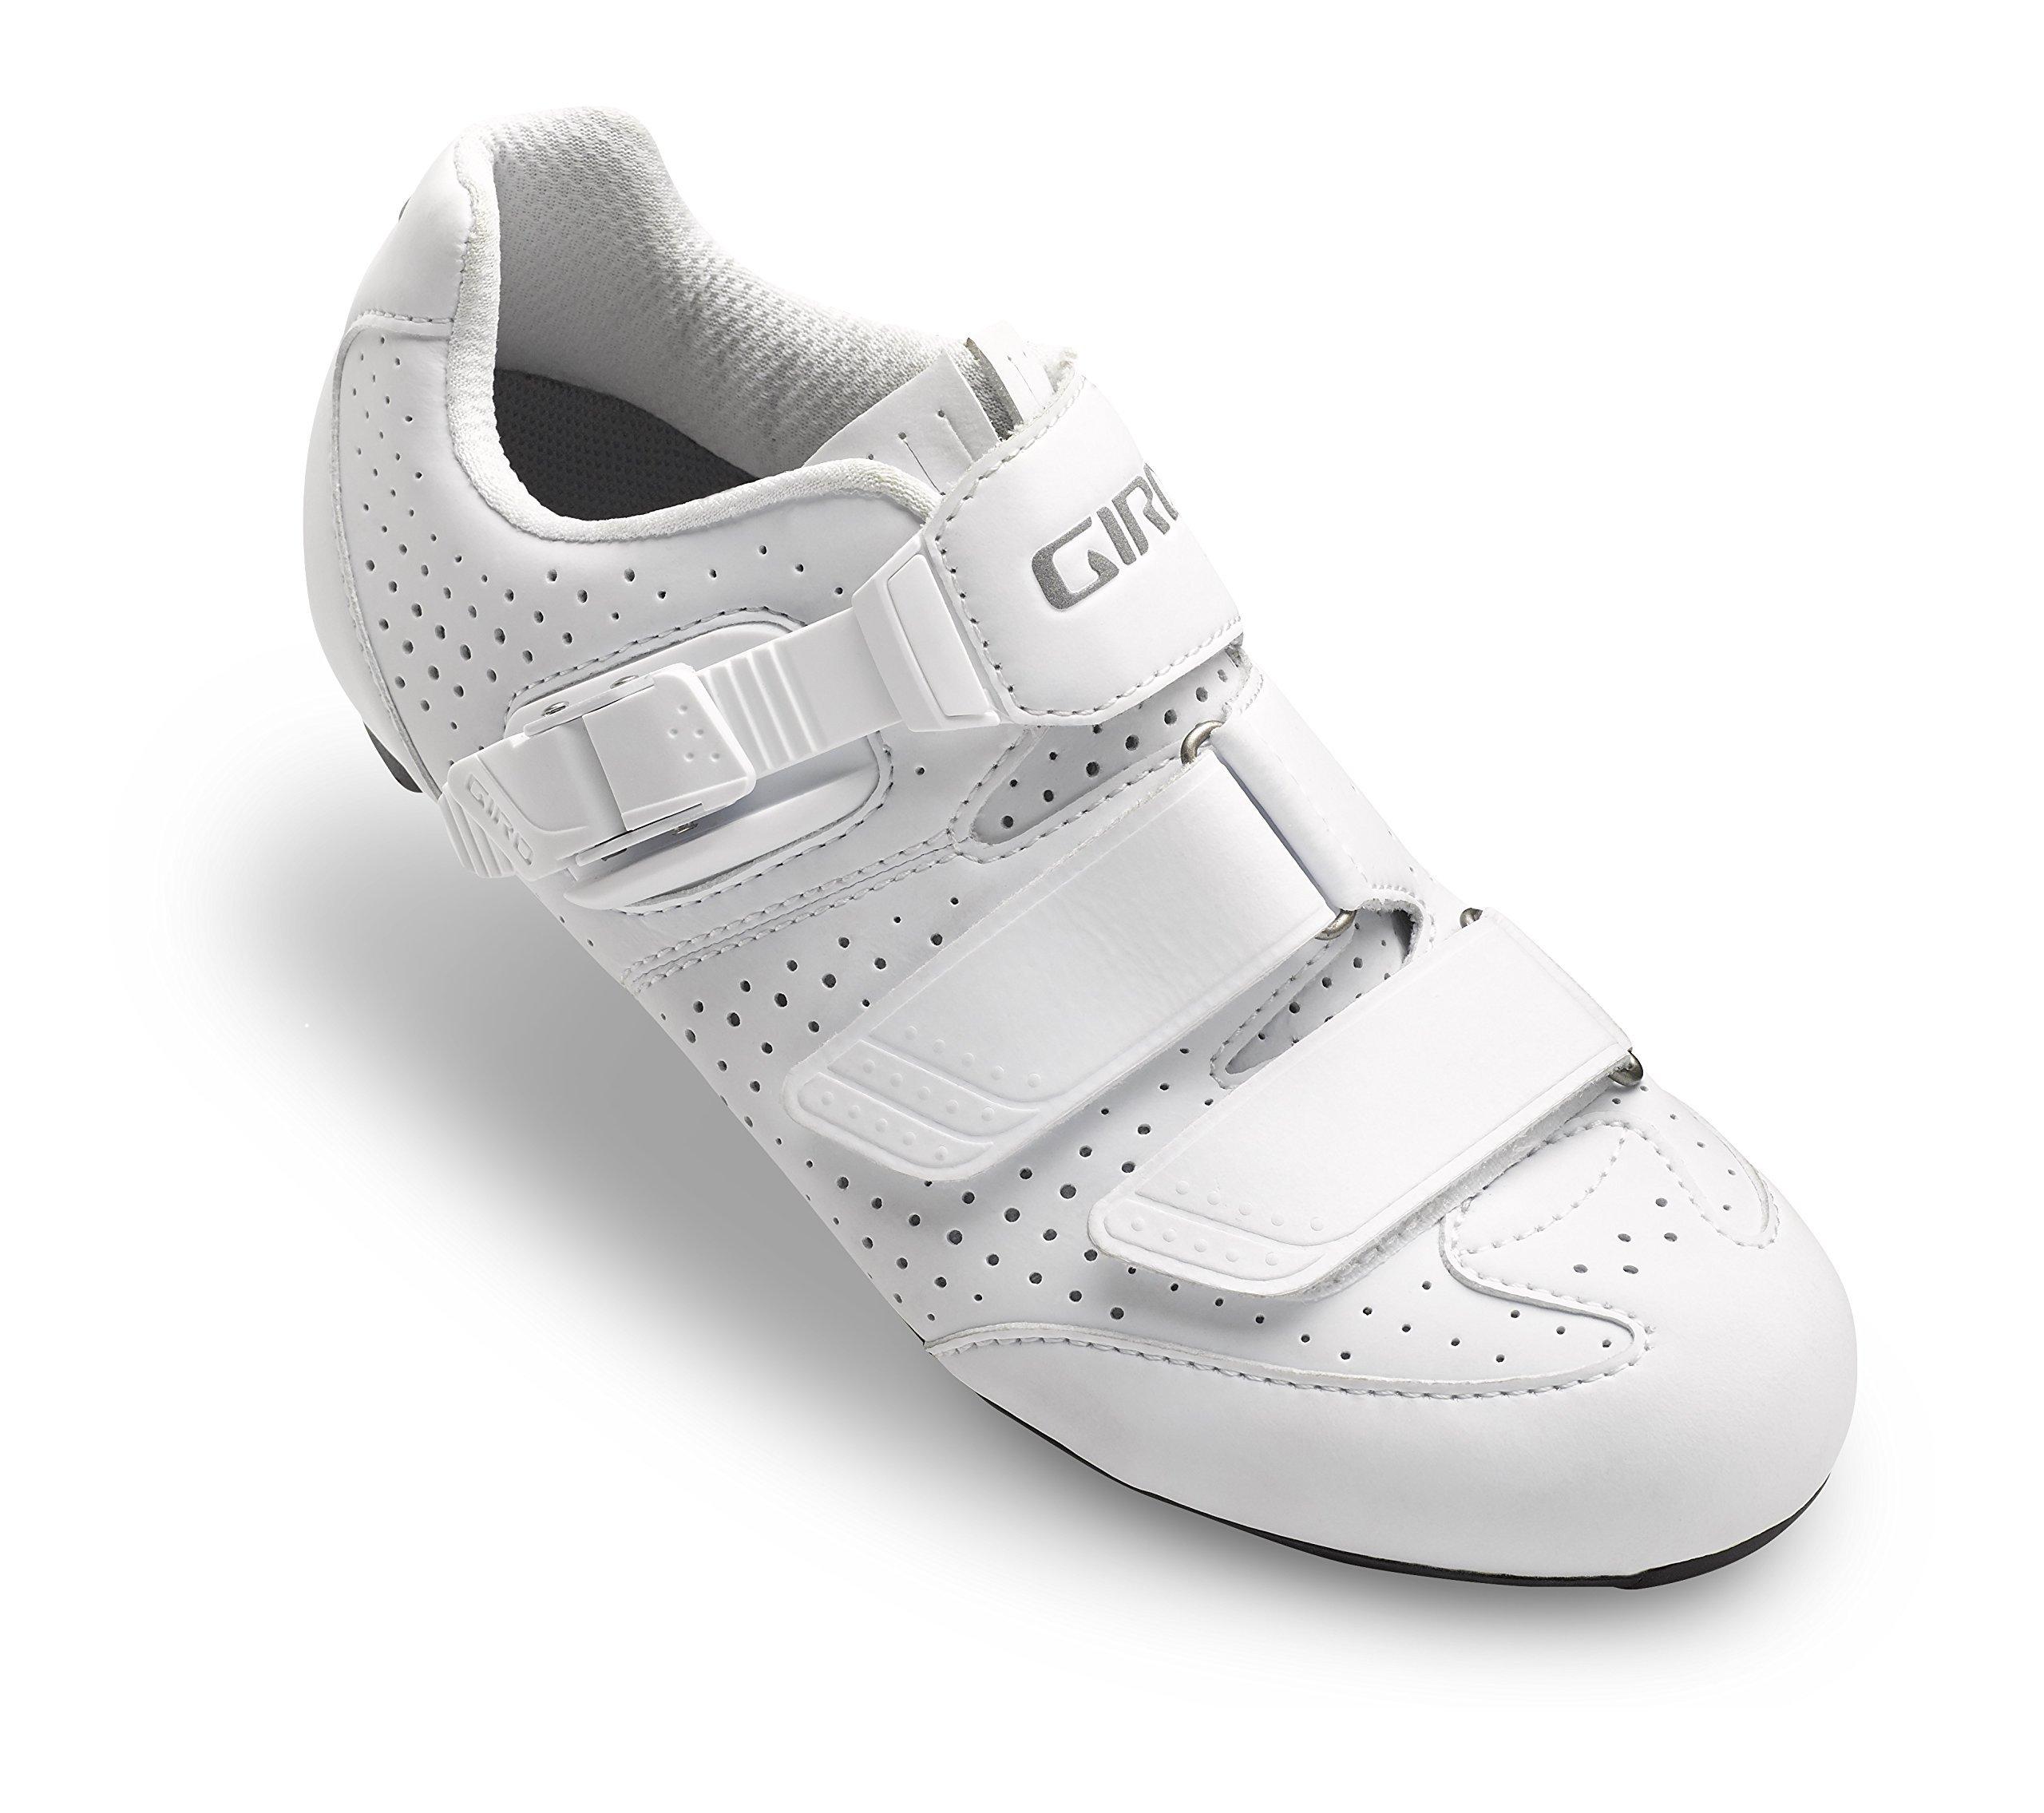 Giro Espada E70 Bike Shoe - Women's Matte White 38